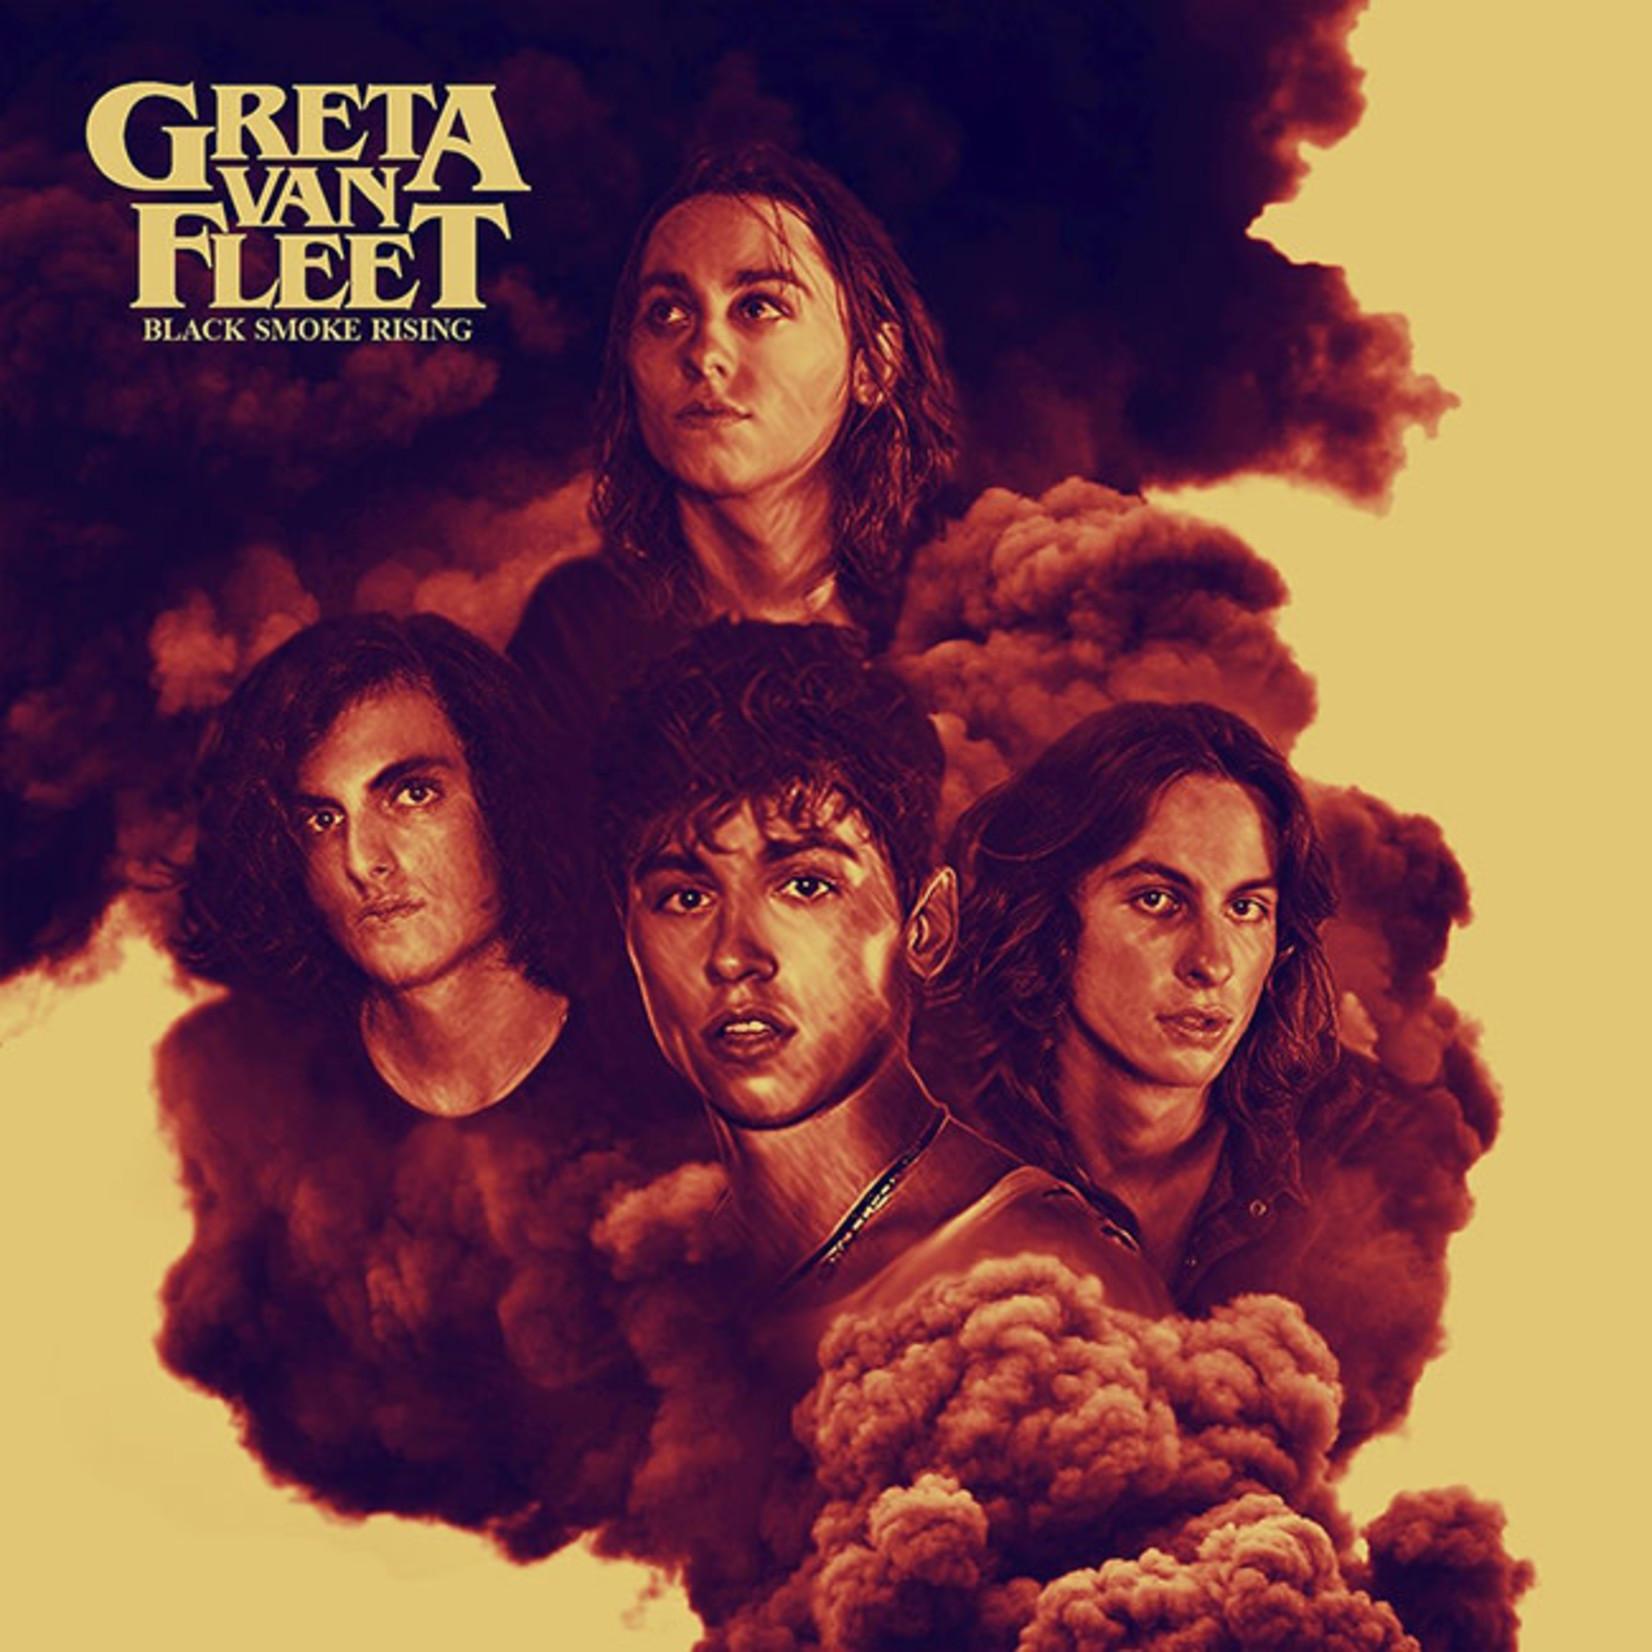 [New] Greta Van Fleet: Black Smoke Rising EP